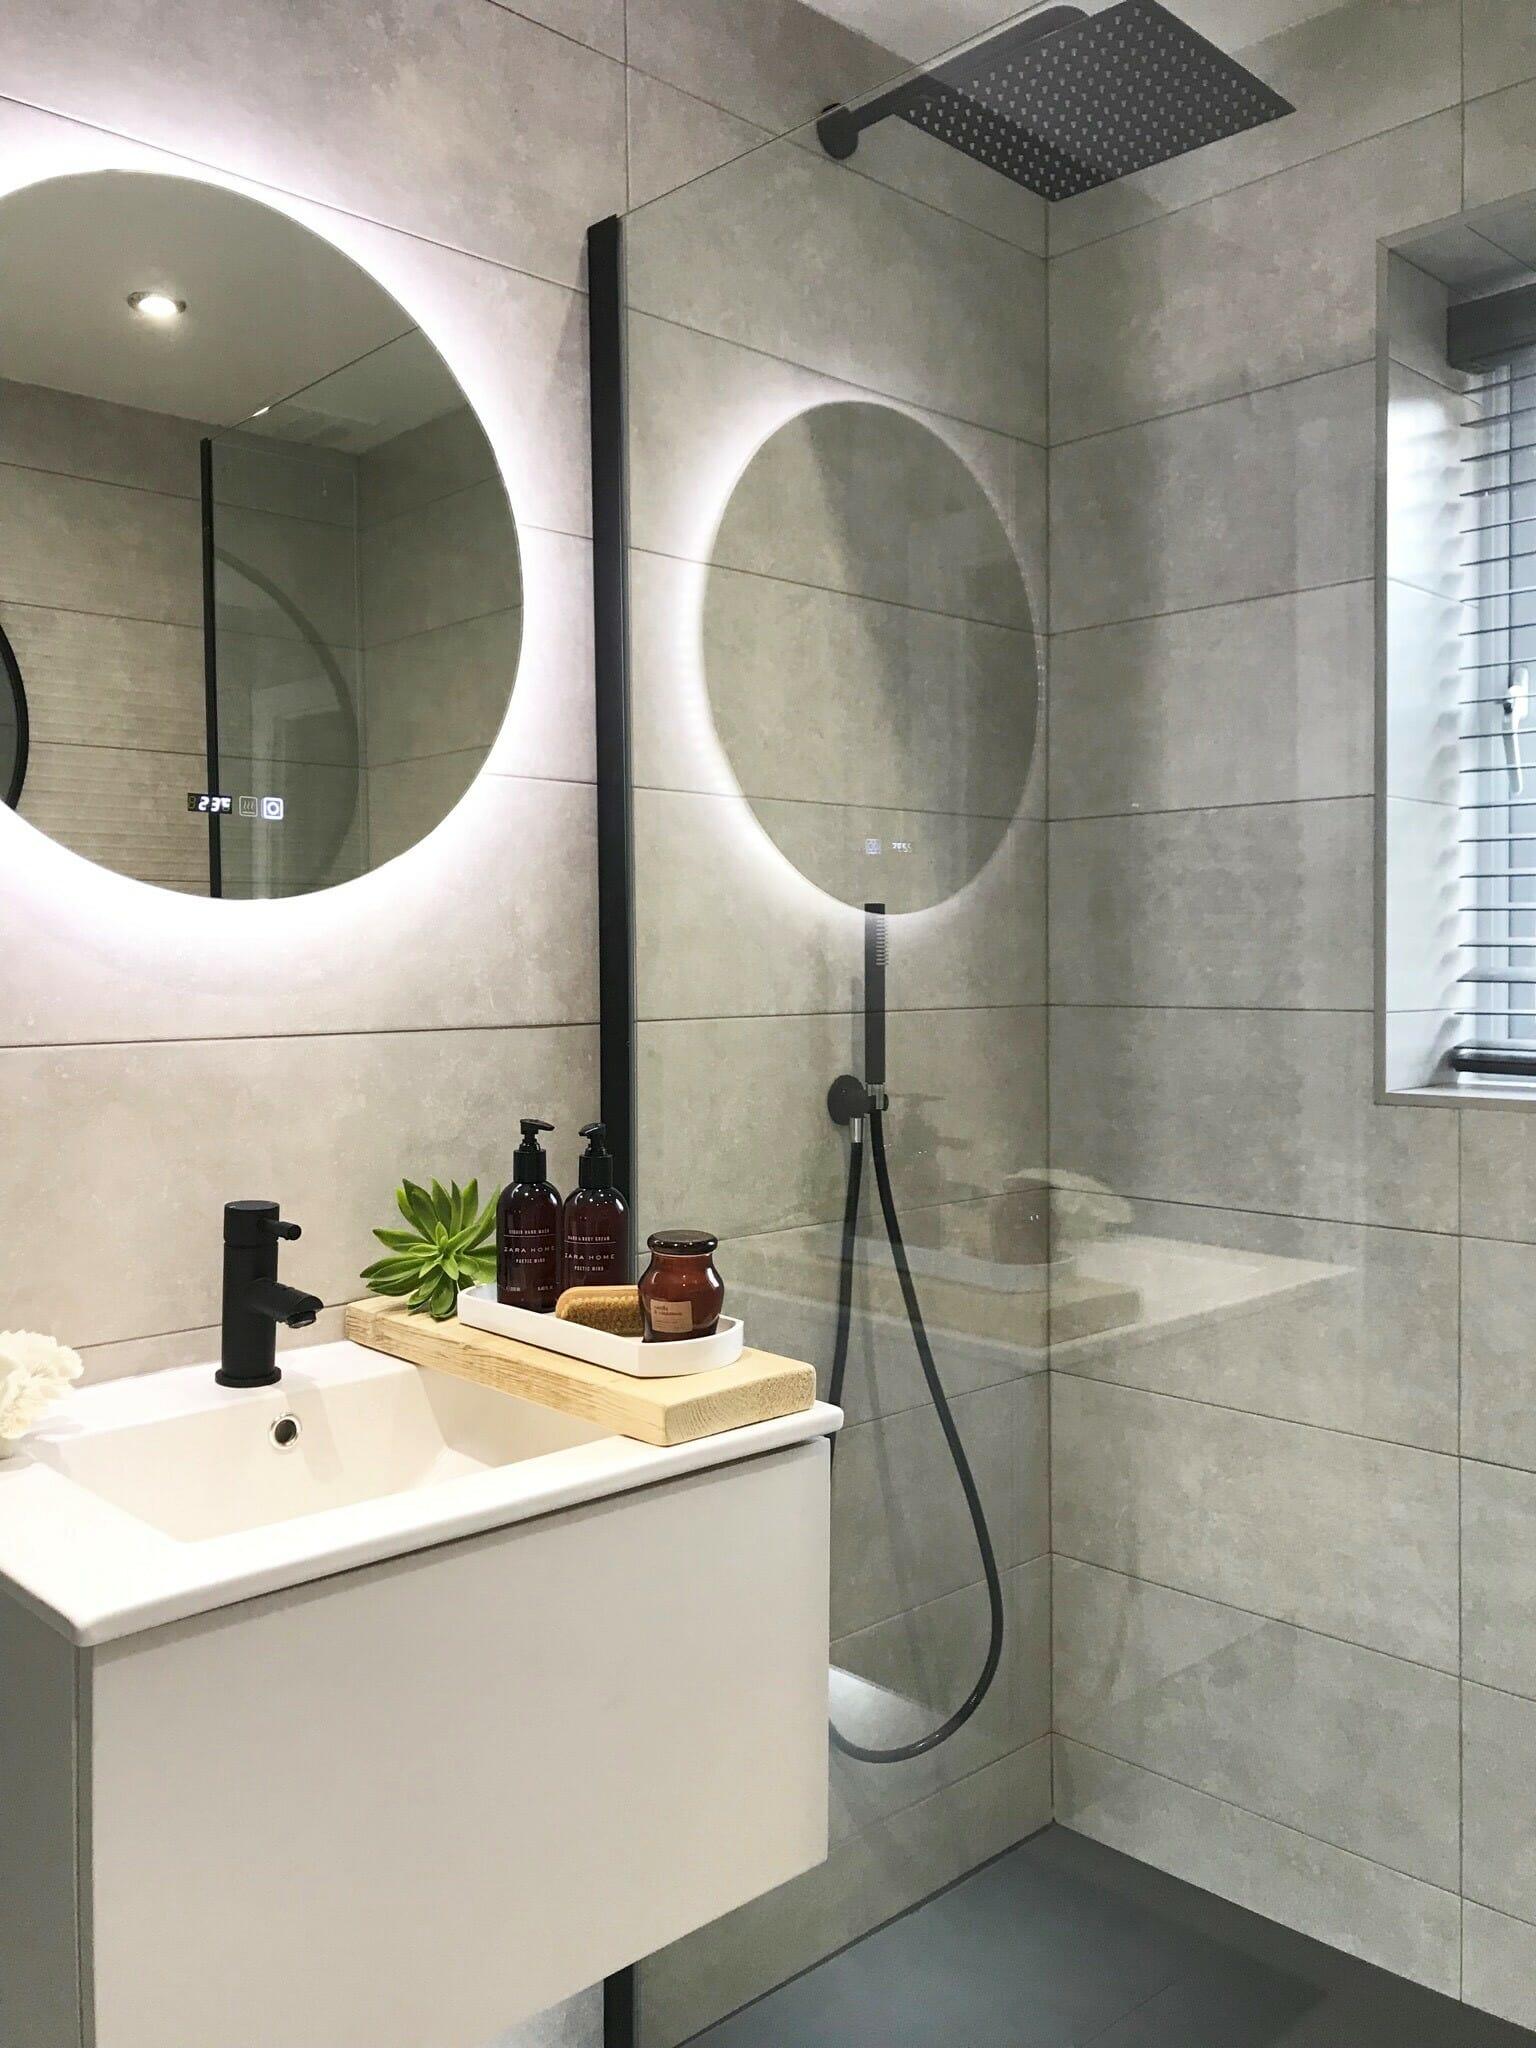 customer oxley bathroom storage image